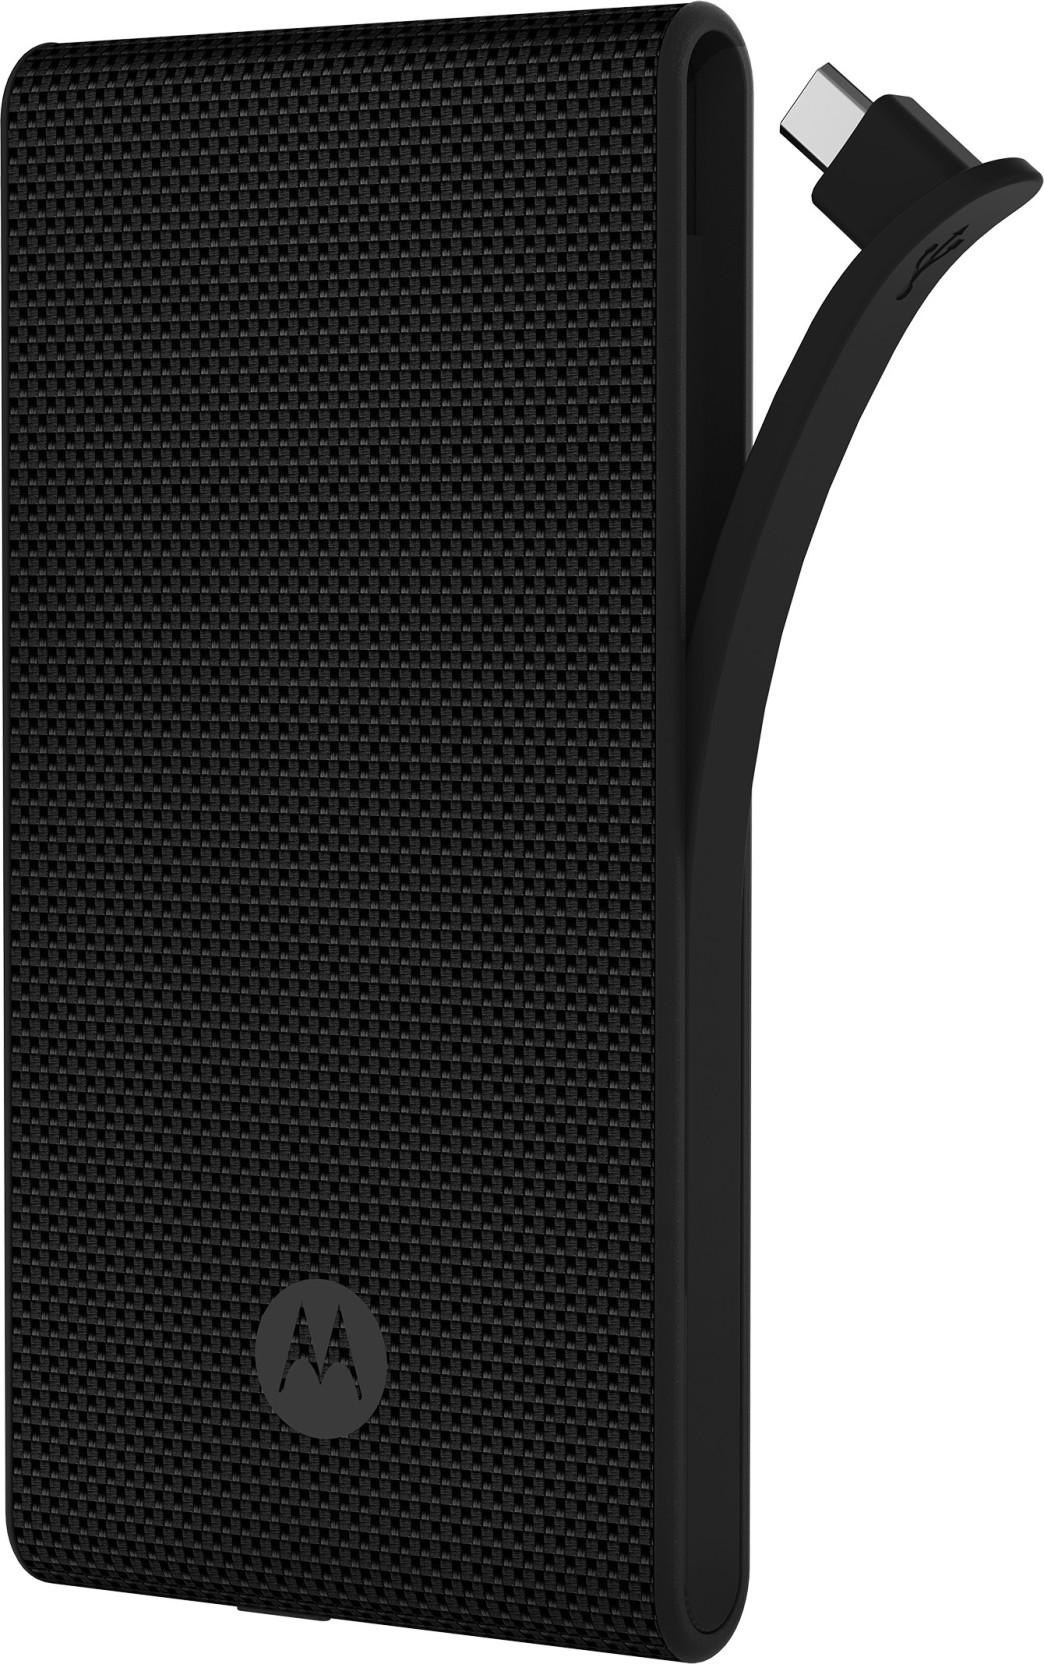 Motorola 5100 Mah Power Bank P5100 Pack Slim Price In India Motorolla Moto E3 Casing Back Case Kasing Design 40 Home